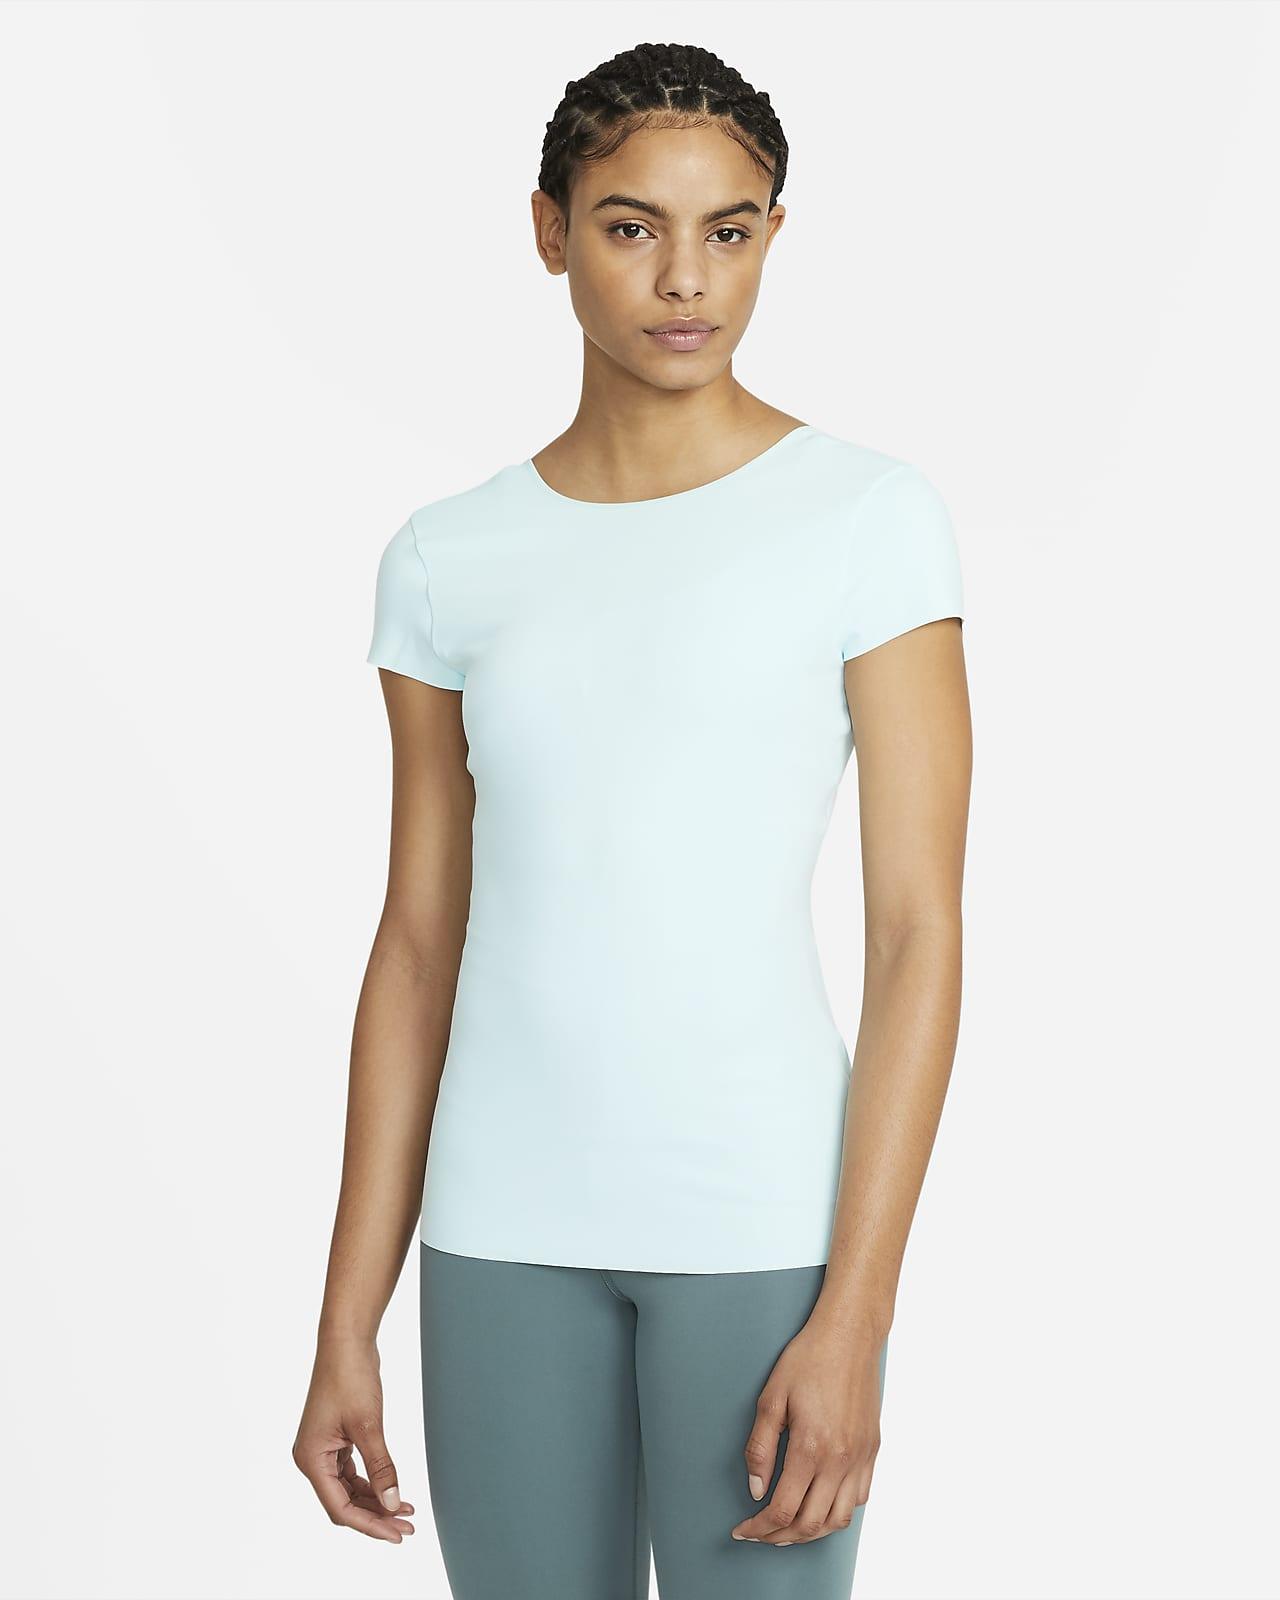 Nike Yoga Luxe Women's Short Sleeve Top